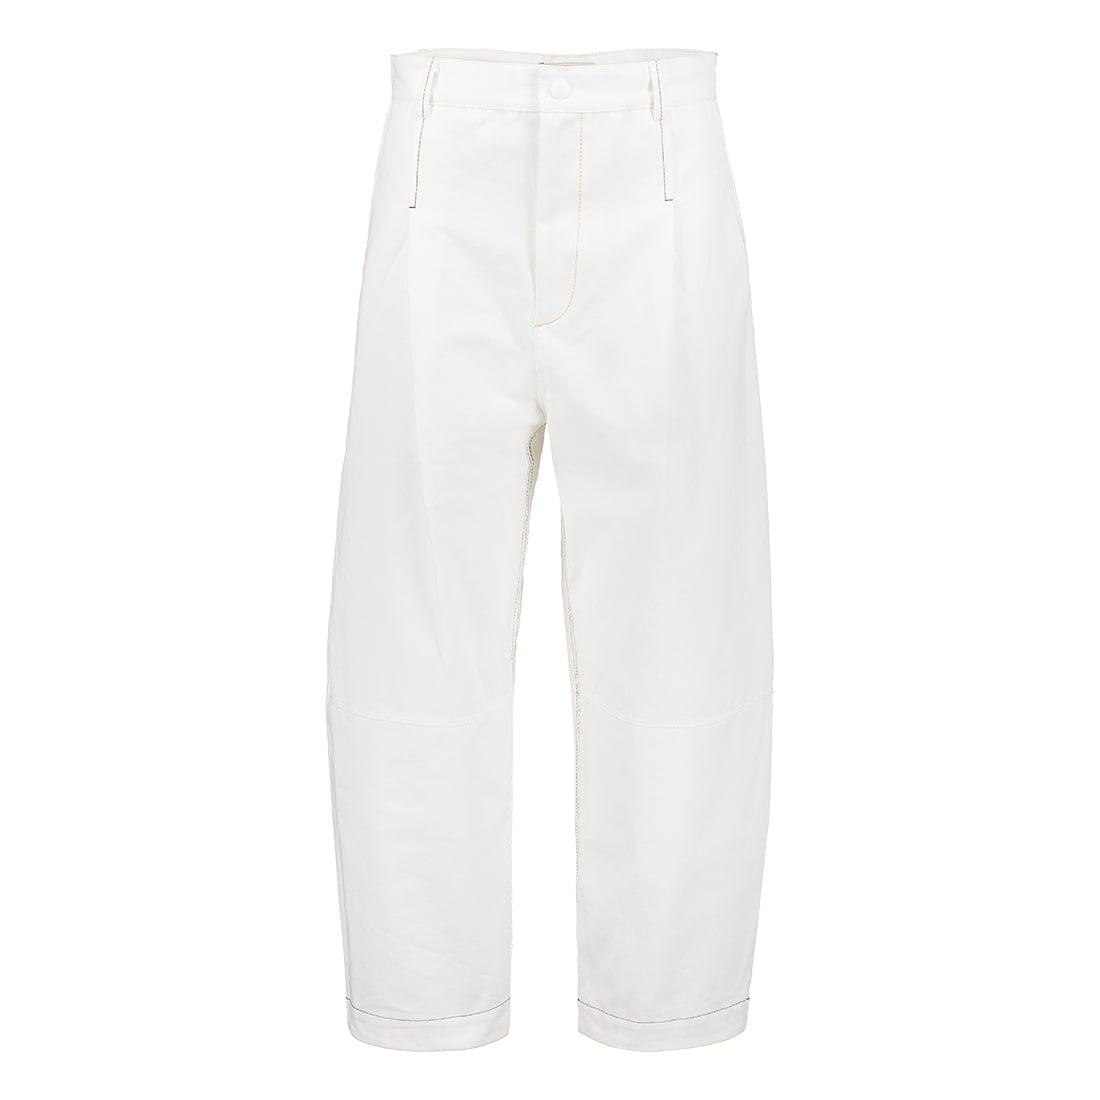 100% cotton cropped denim pant 1